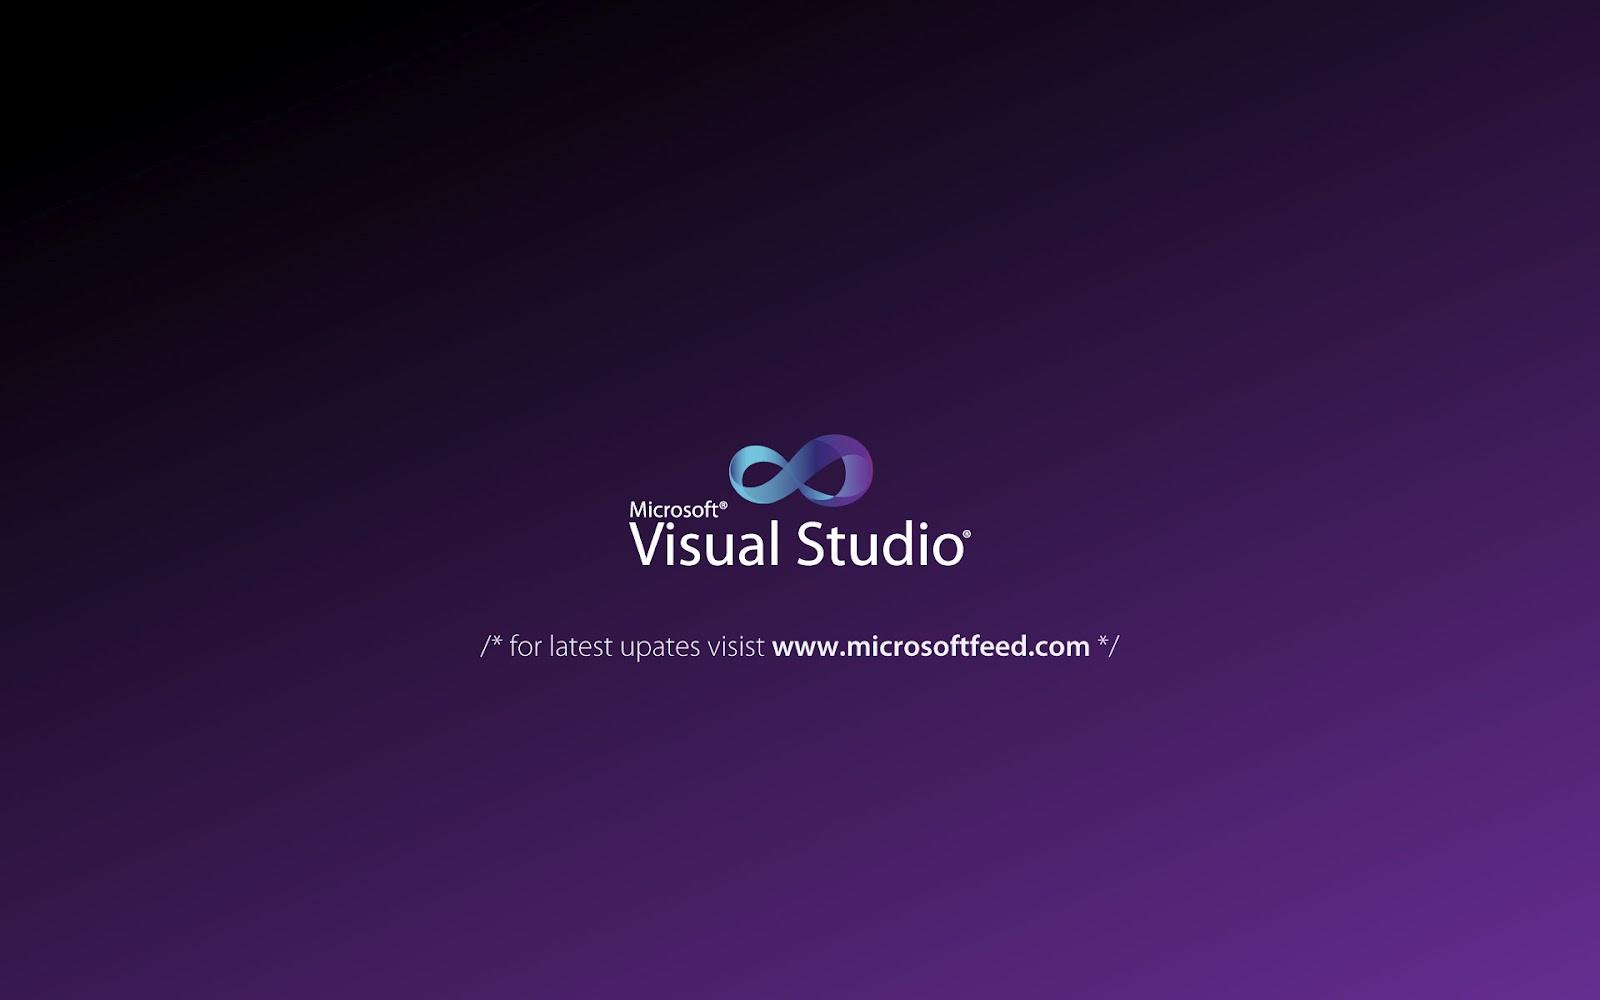 10 HD Microsoft Visual Studio Wallpaper Tam Super 1600x1000